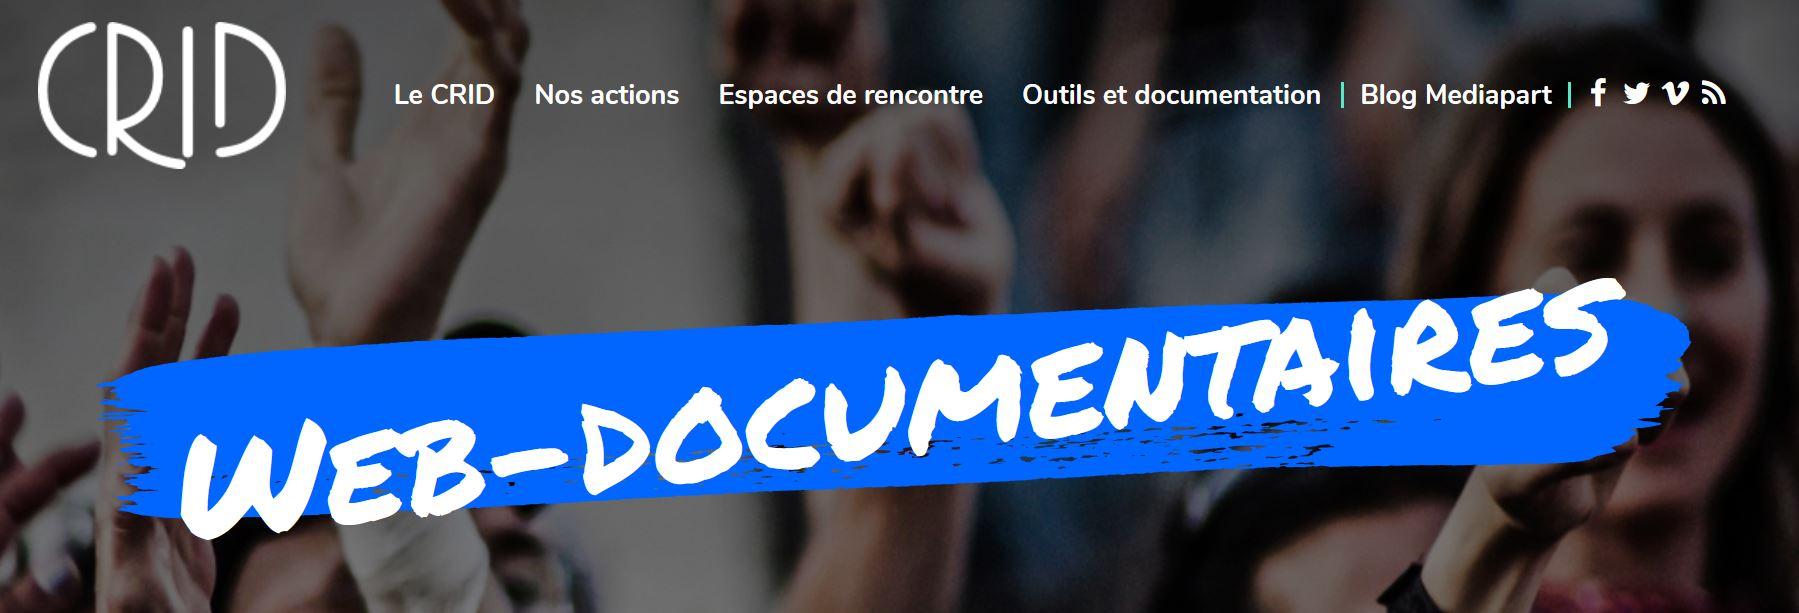 web documentaire CRID